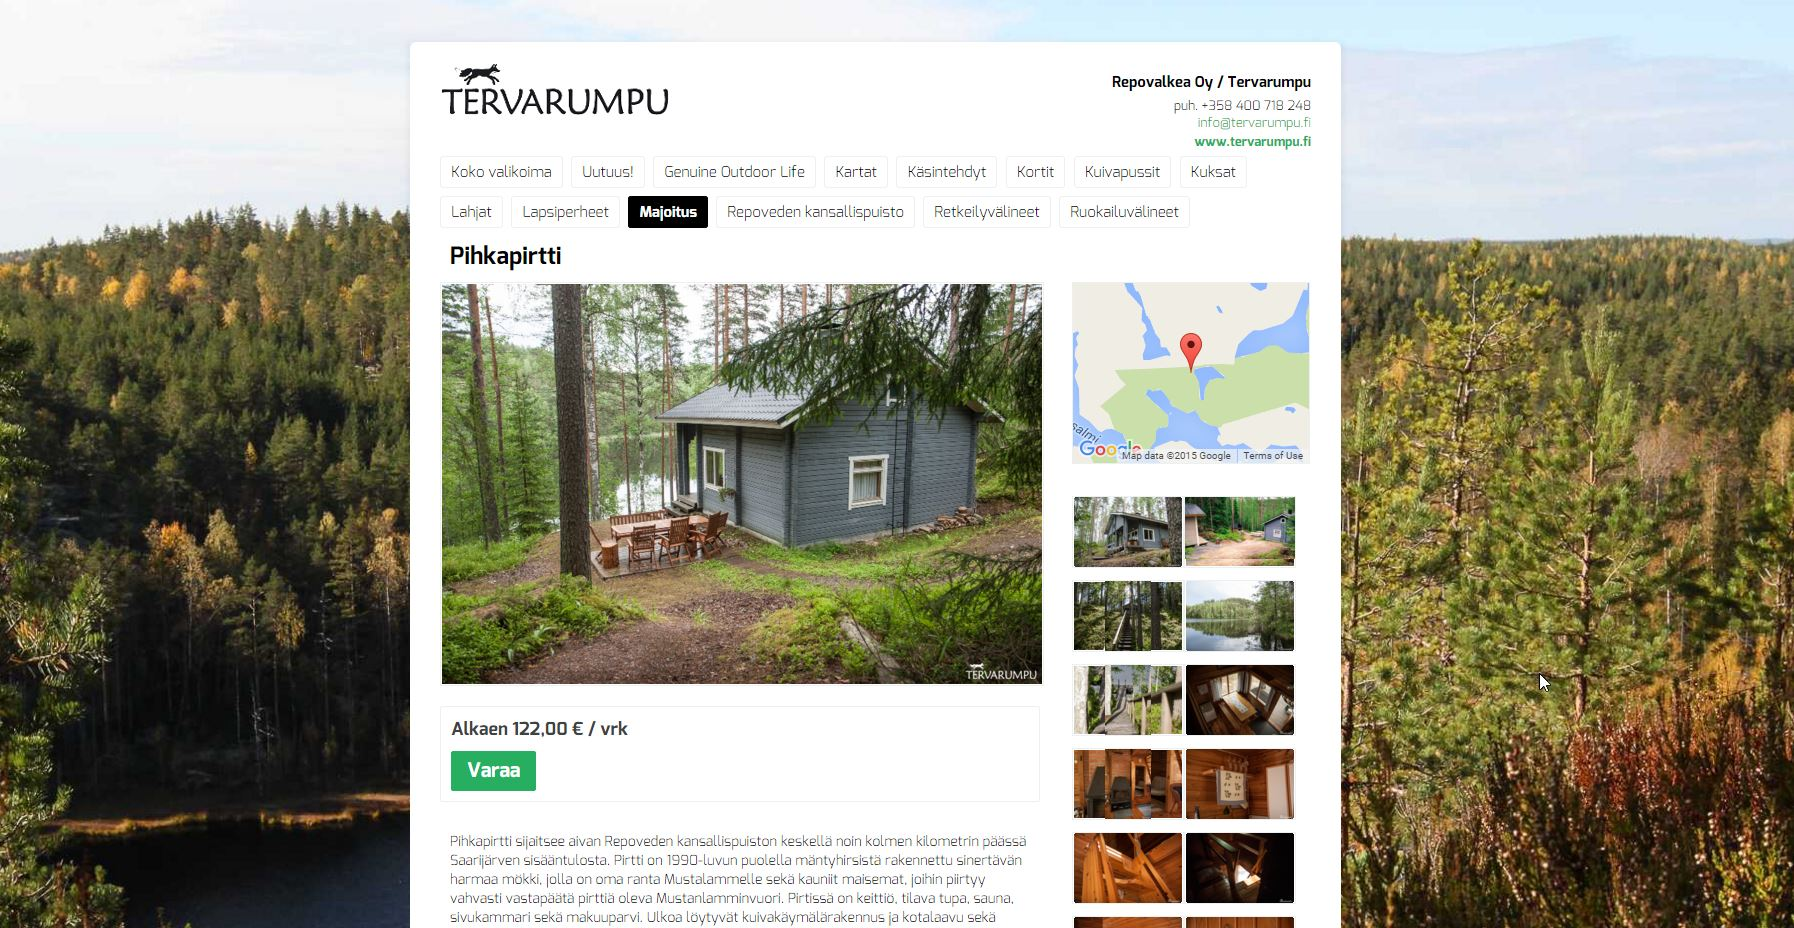 Johku Kauppapaikka: Pihkapirtti / Tervarumpu